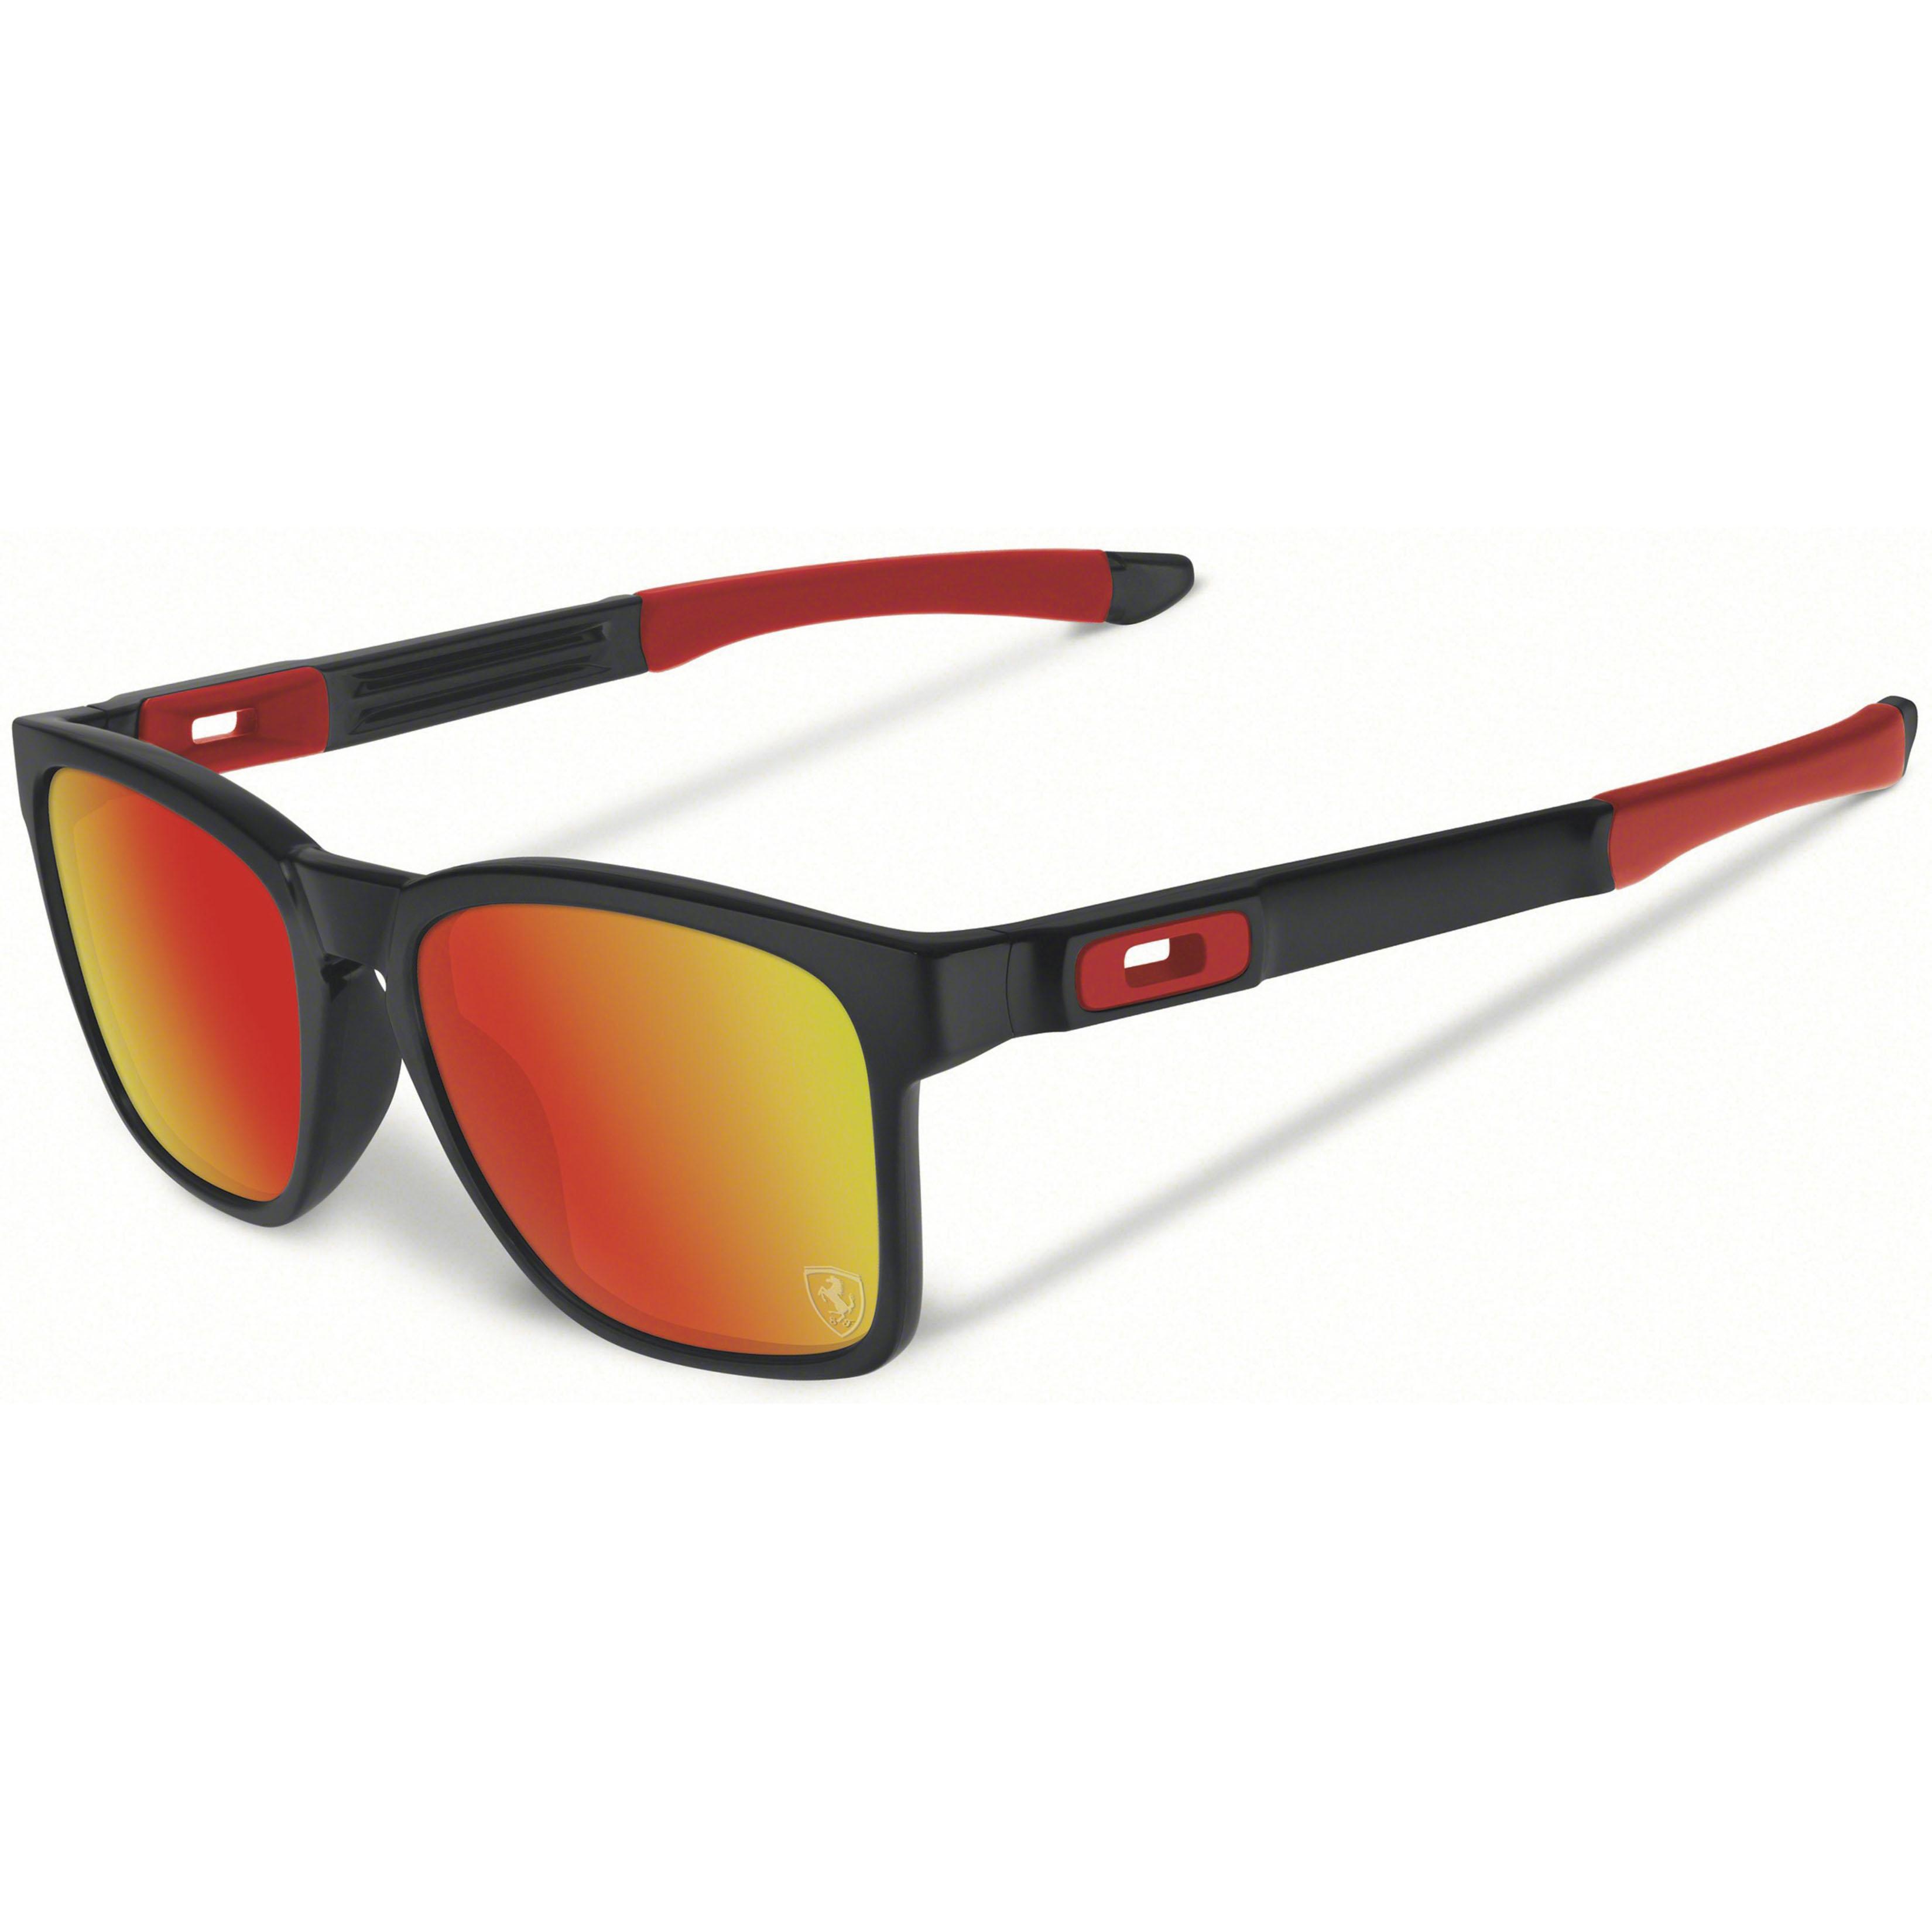 Oakley Catalyst Sunglasses Matte Black ruby iridium Scuderi Ferrari 167 74bed761b1